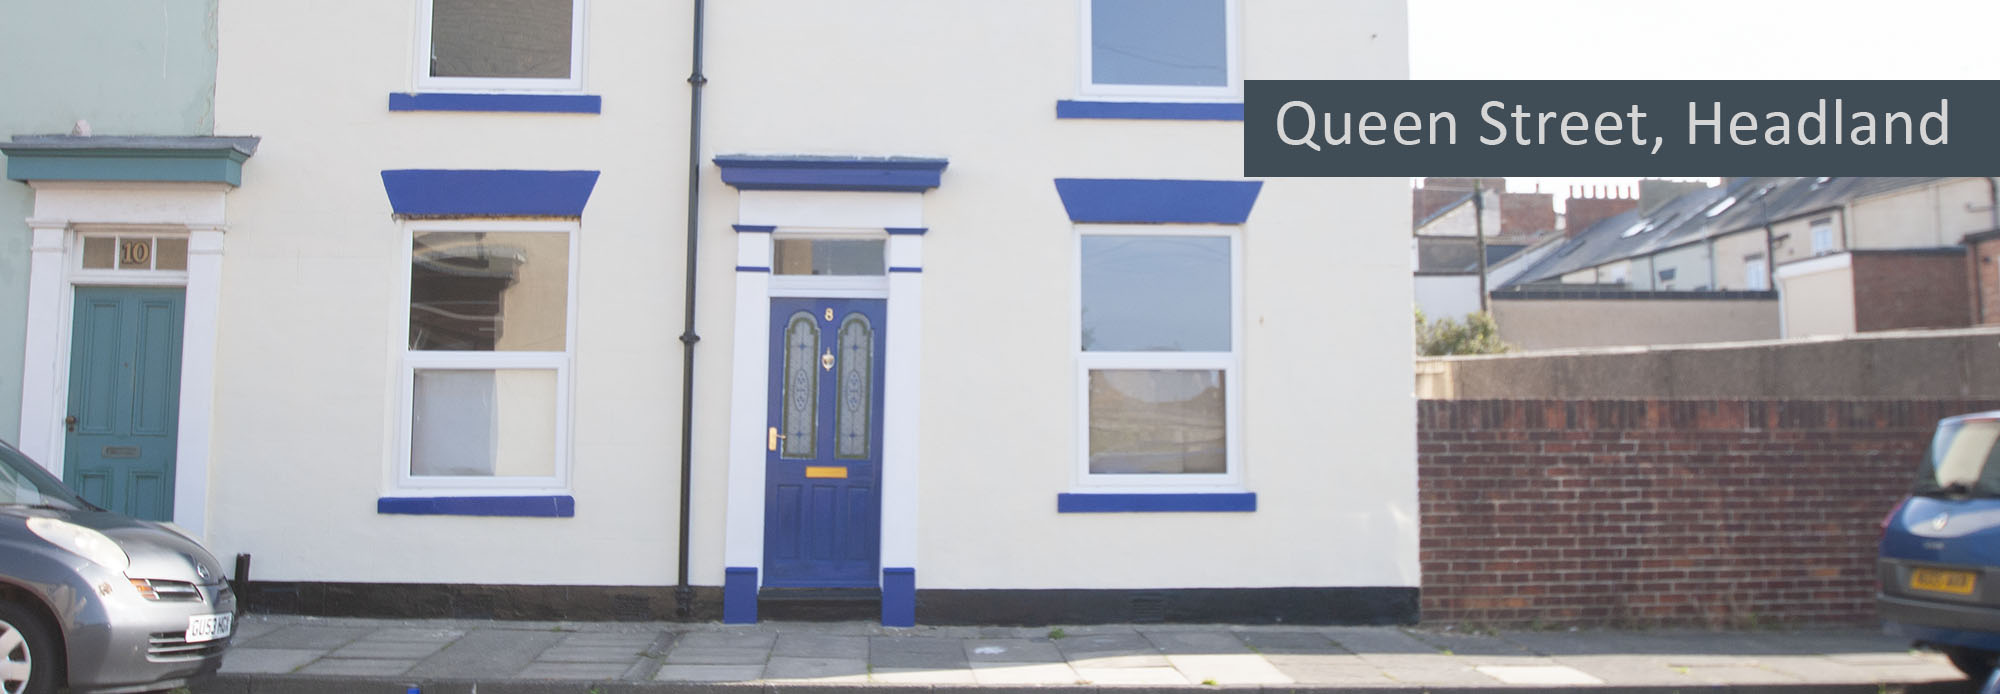 Queen Street The Headland Hartlepool *REDUCED* £119,000